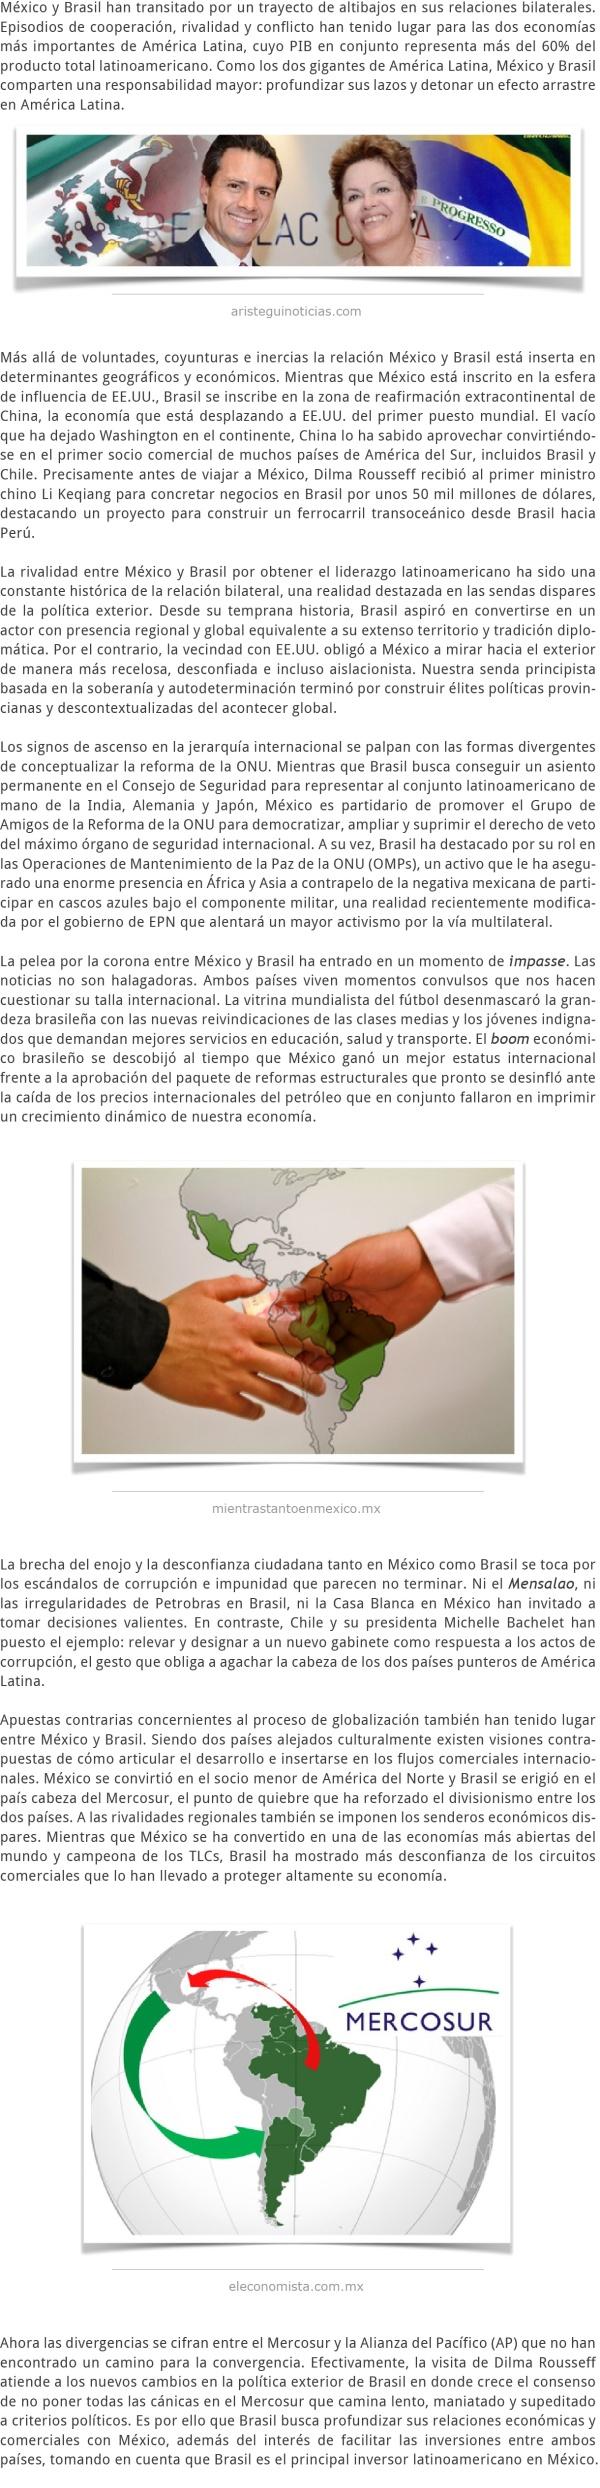 LA VISITA DE ESTADO DE DILMA ROUSSEFF A MÉXICO